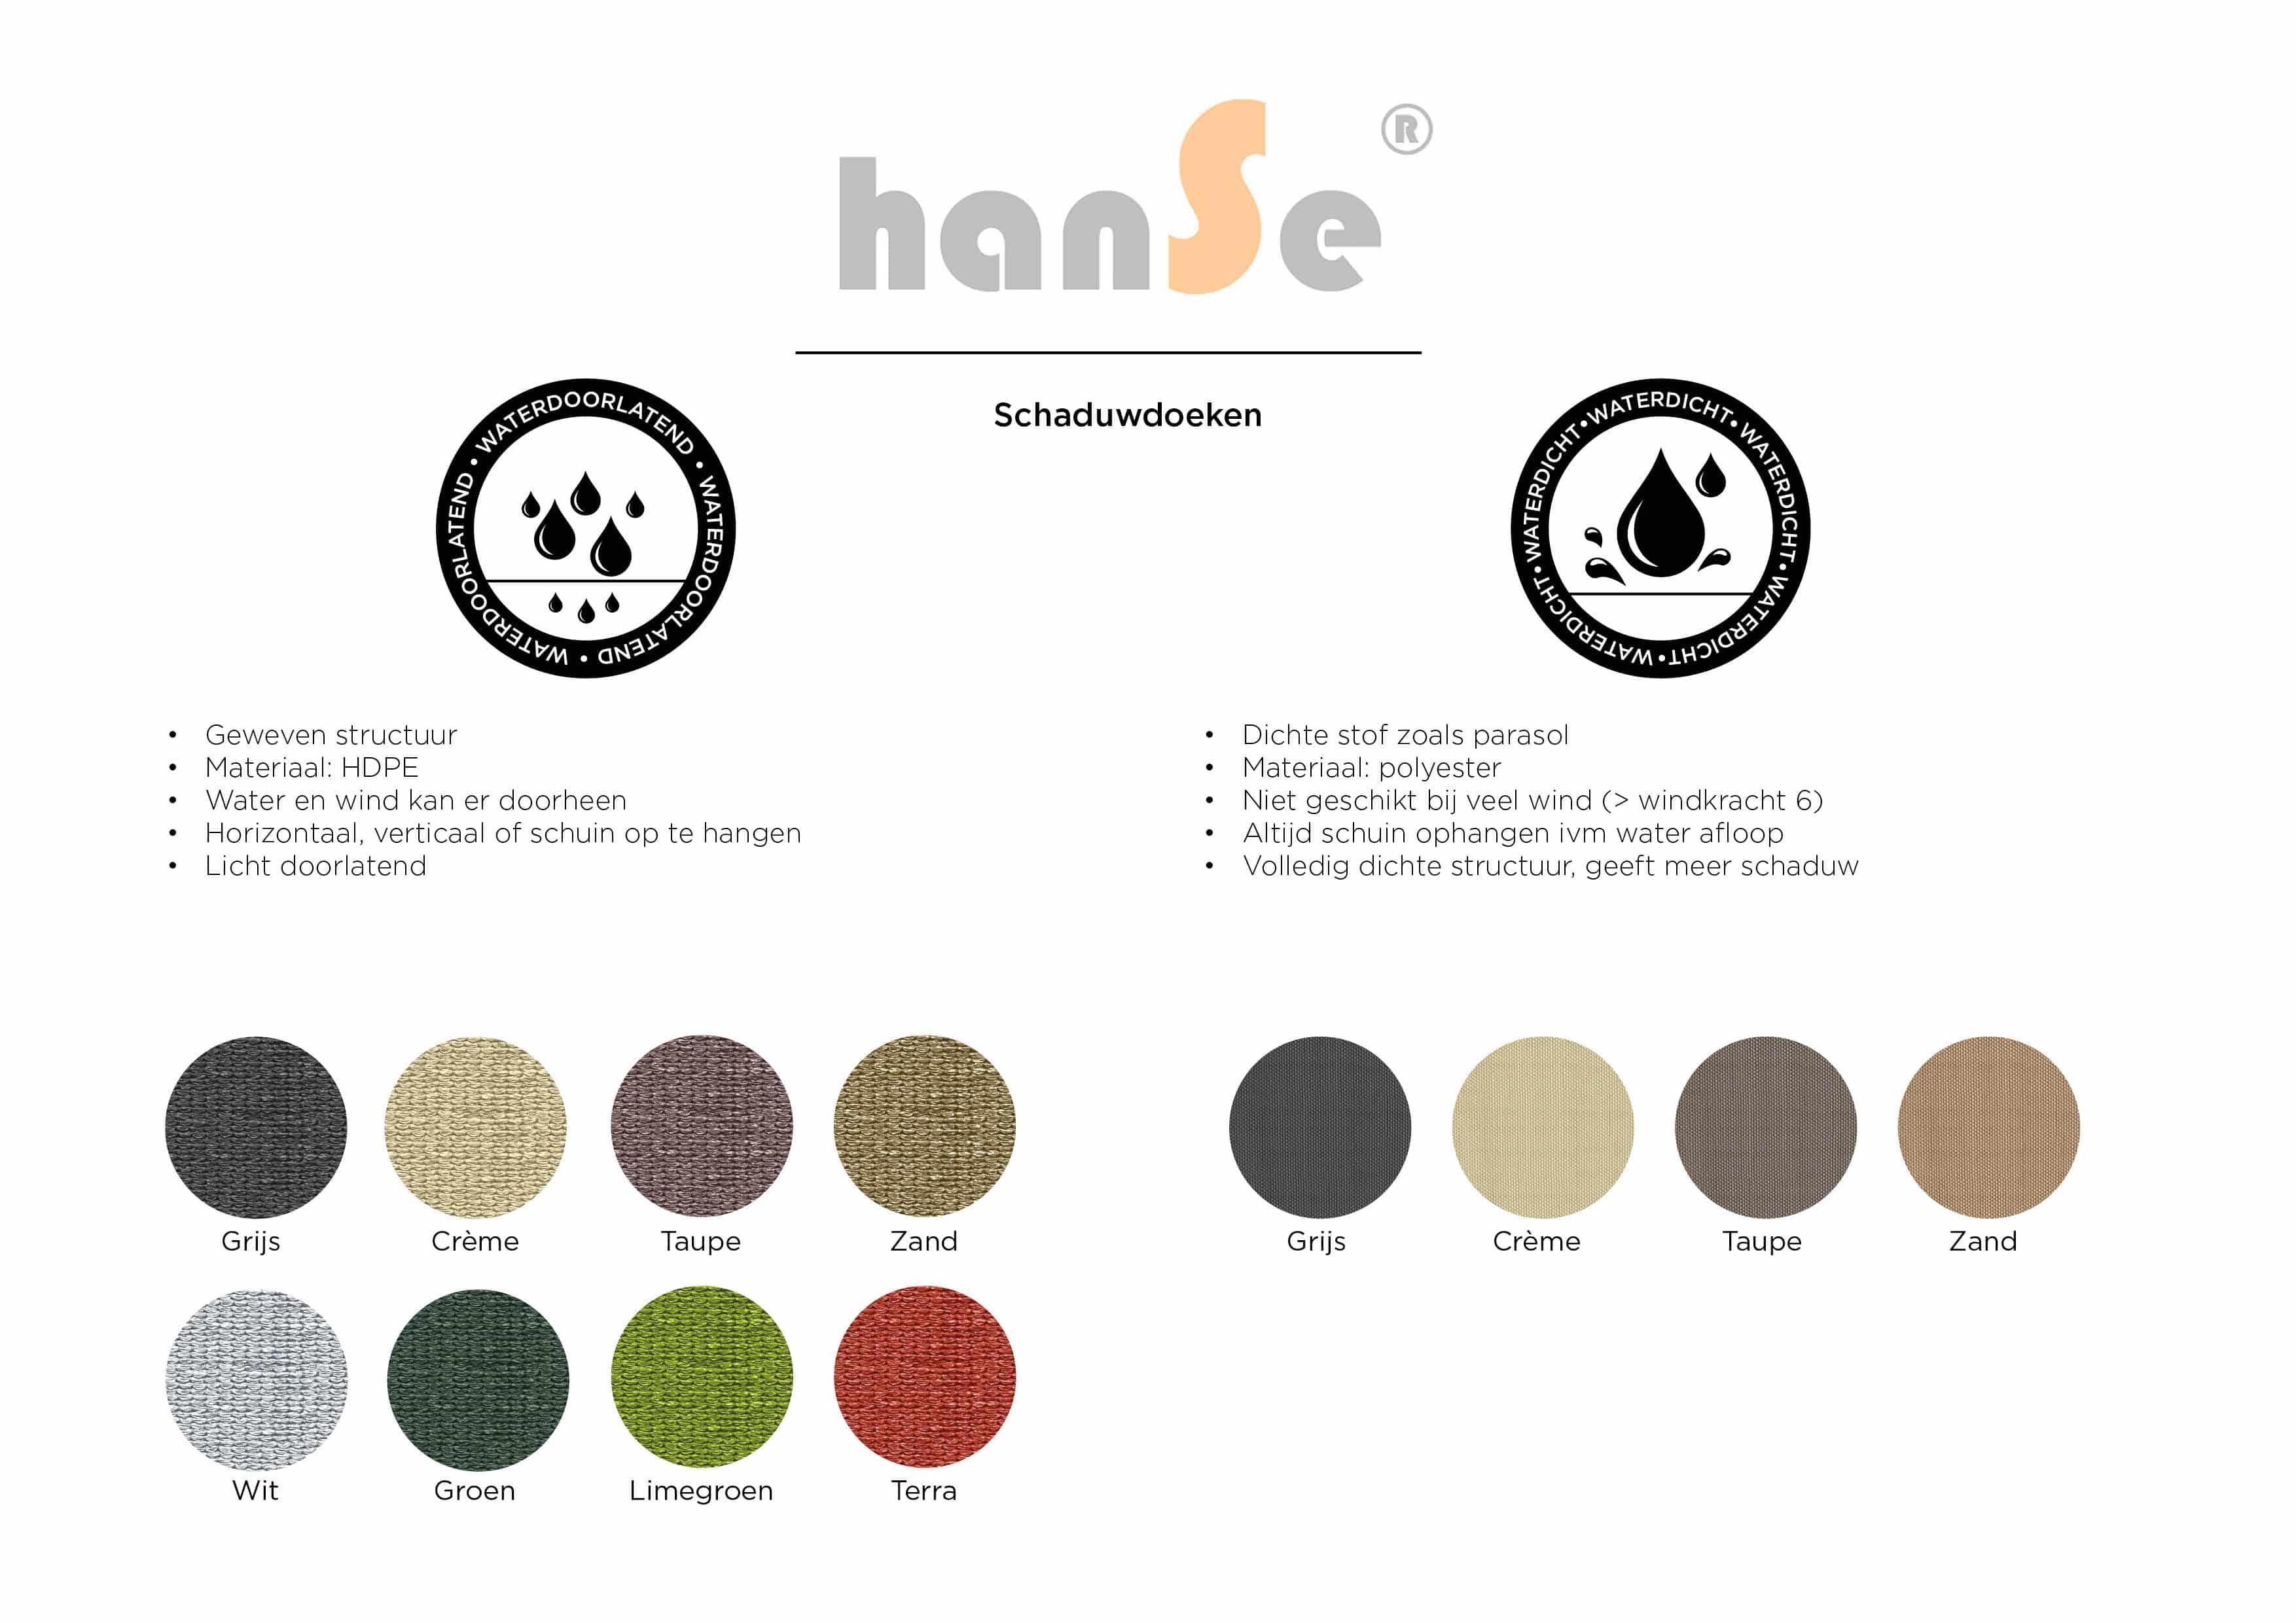 hanSe® Schaduwdoek Trapezium Waterdoorlatend 3/4x3 m - Zand